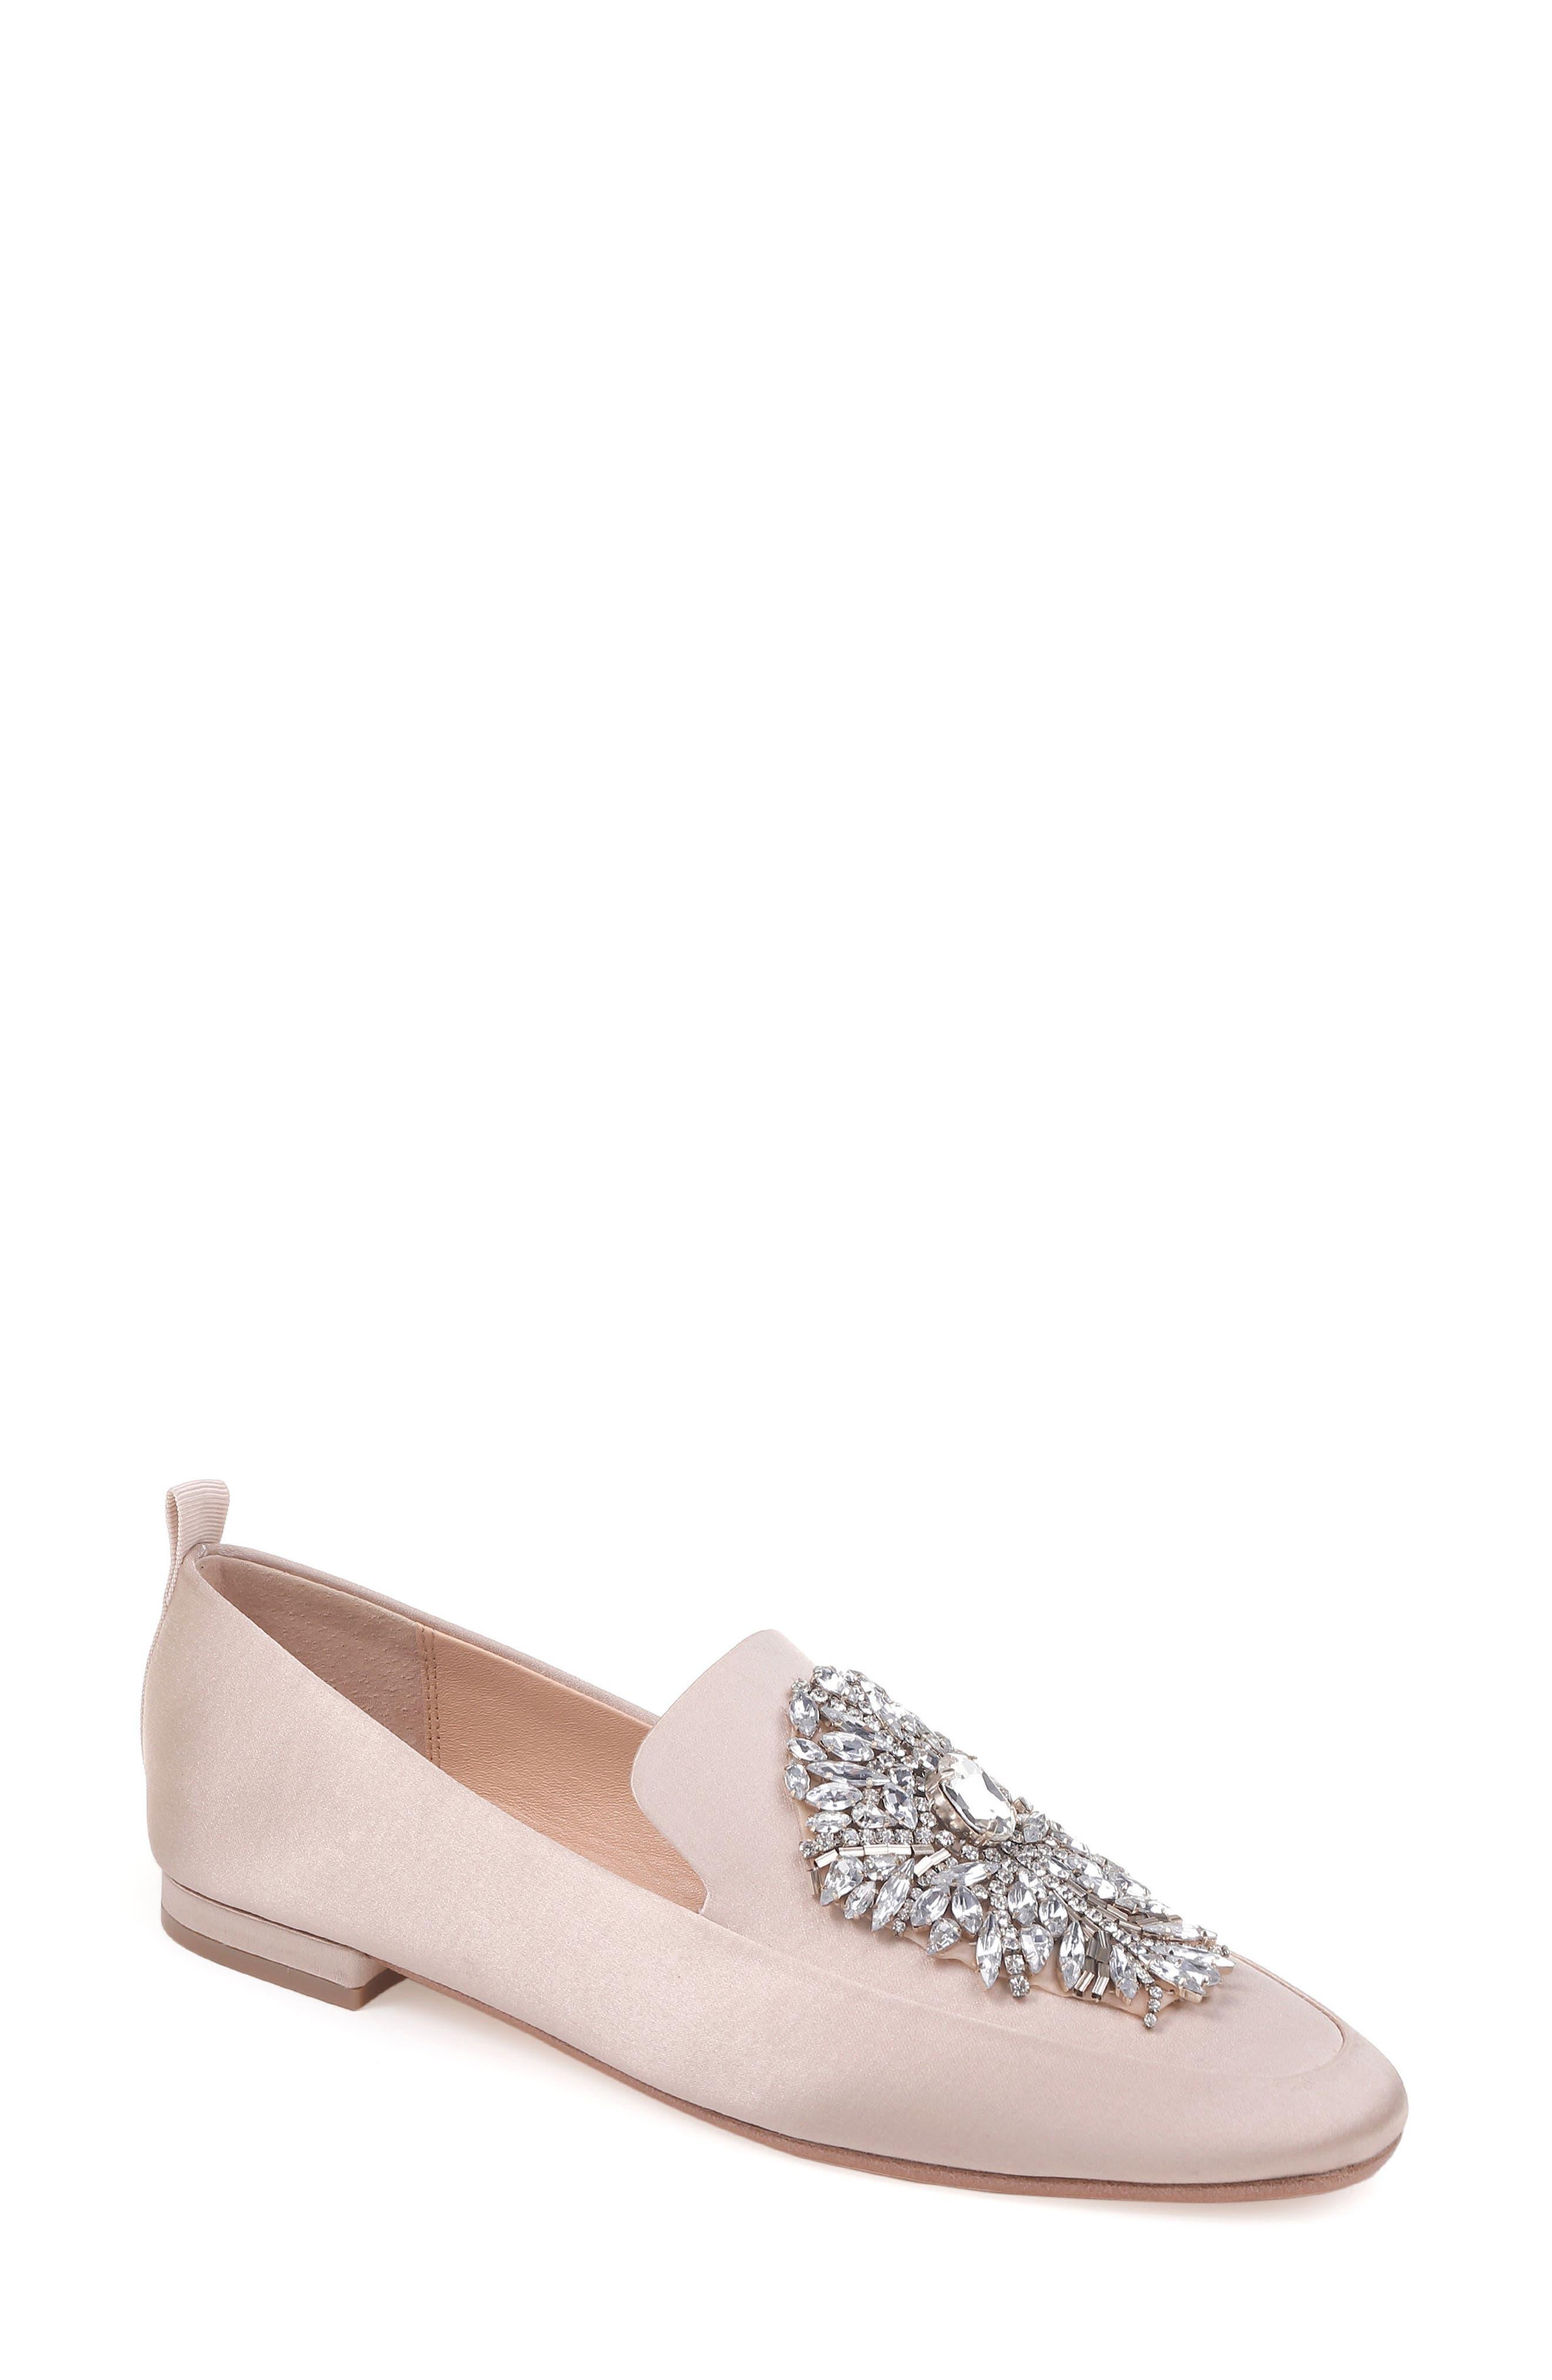 Badgley Mischka Salma Crystal Embellished Loafer (Women)